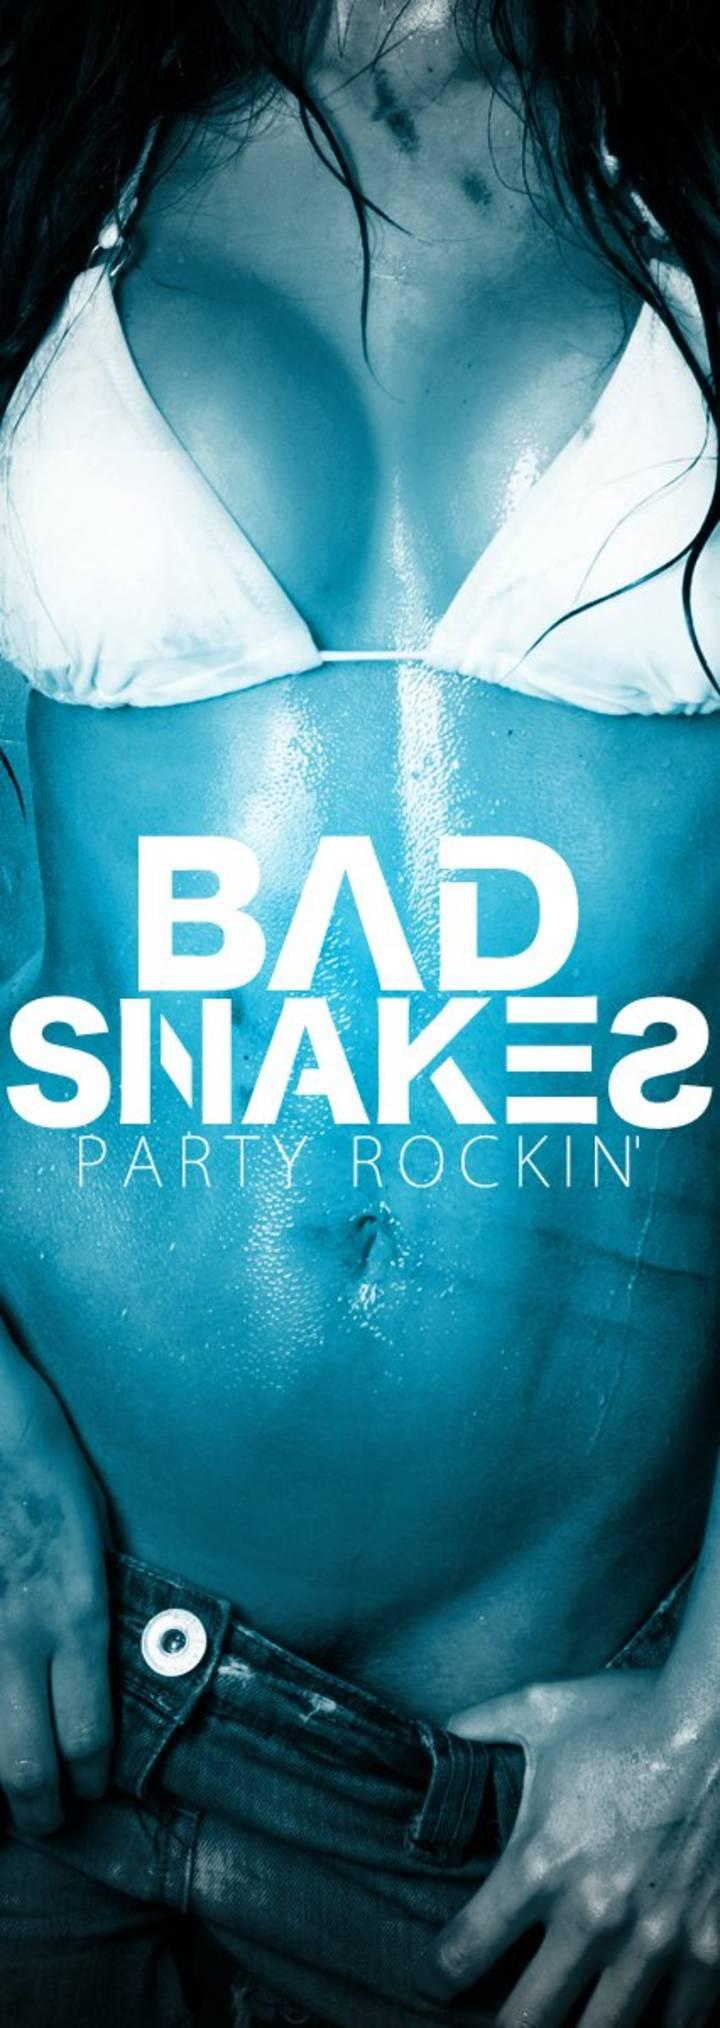 Bad Snakes Tour Dates